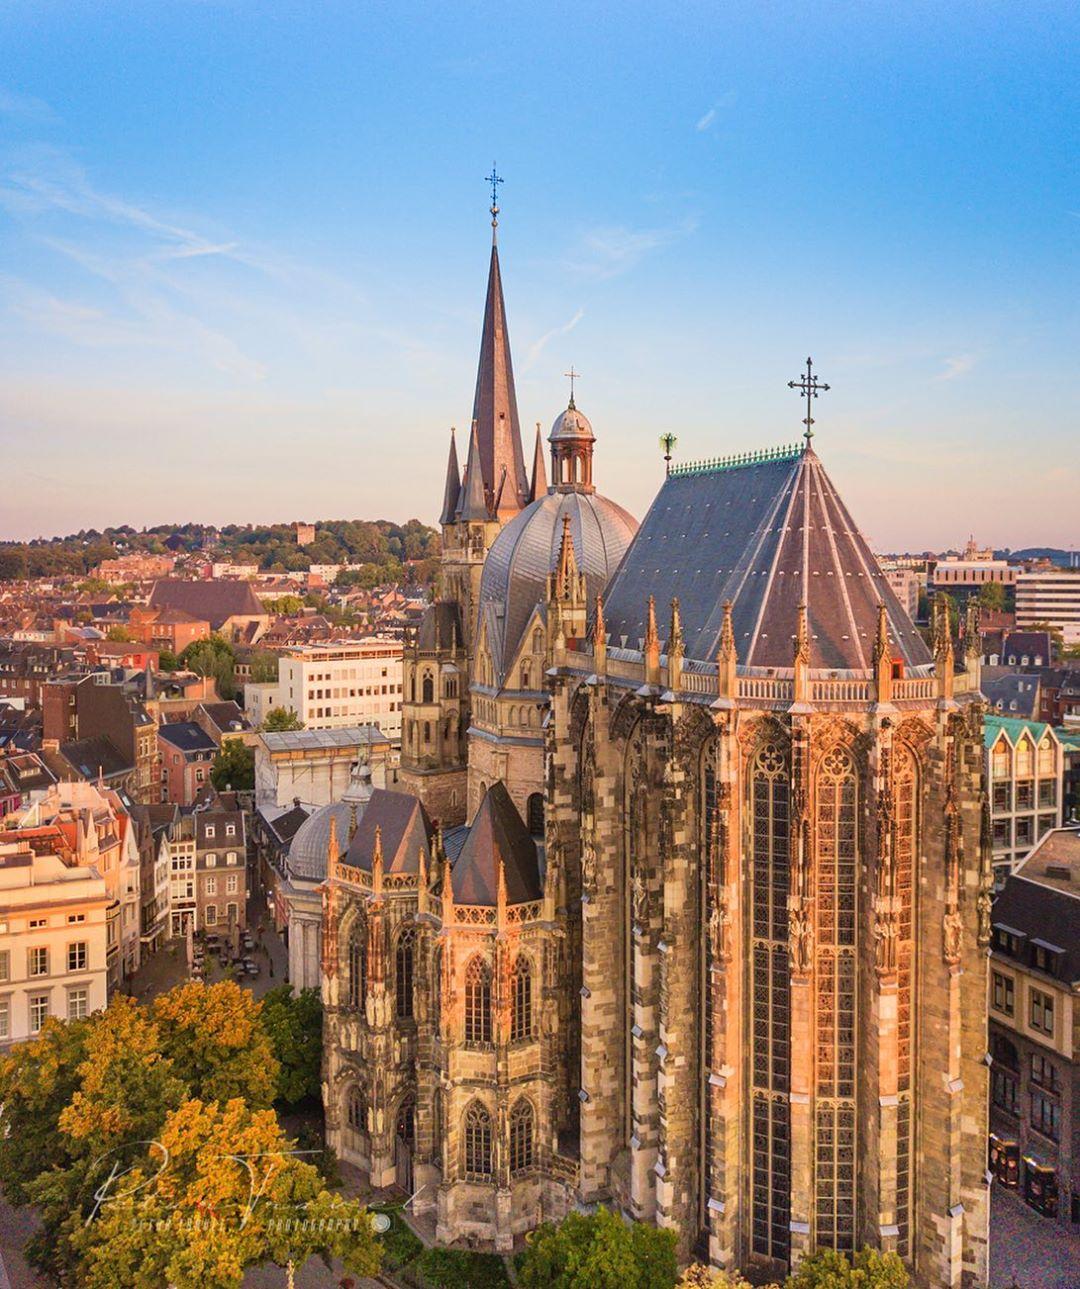 Aachener Dom, Đức